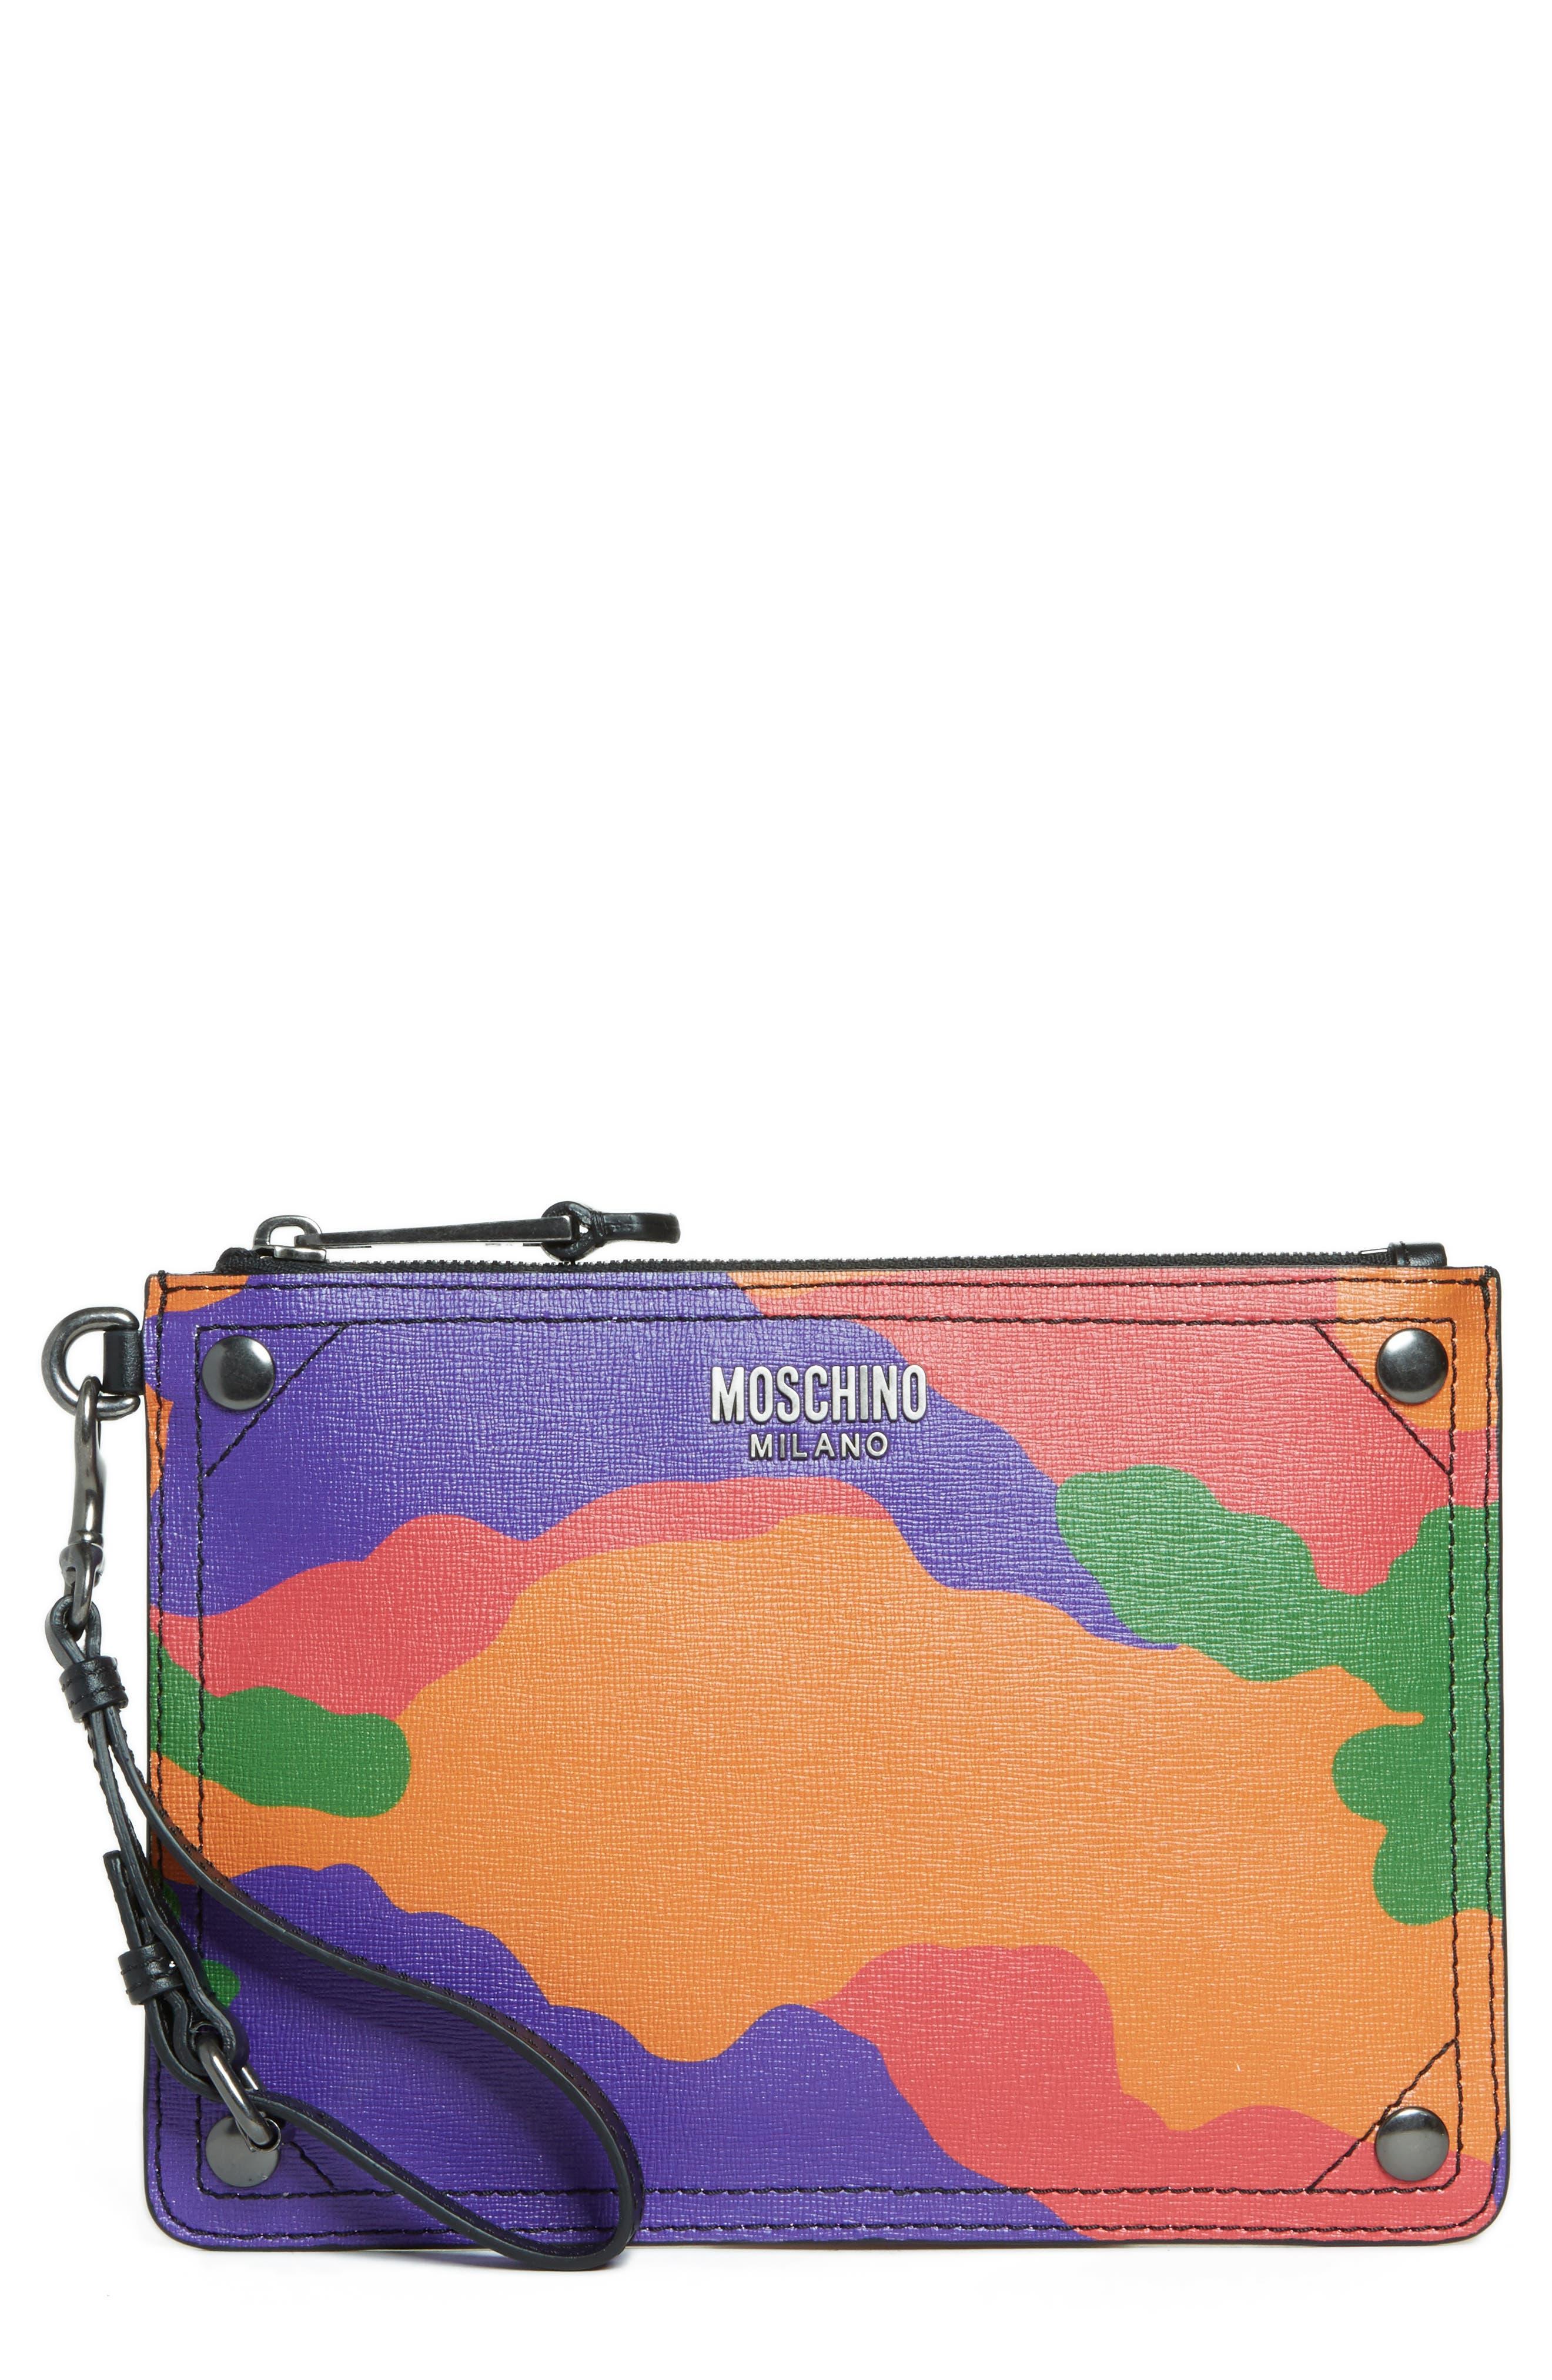 Moschino Multi Camo Print Leather Zip Pouch Wristlet